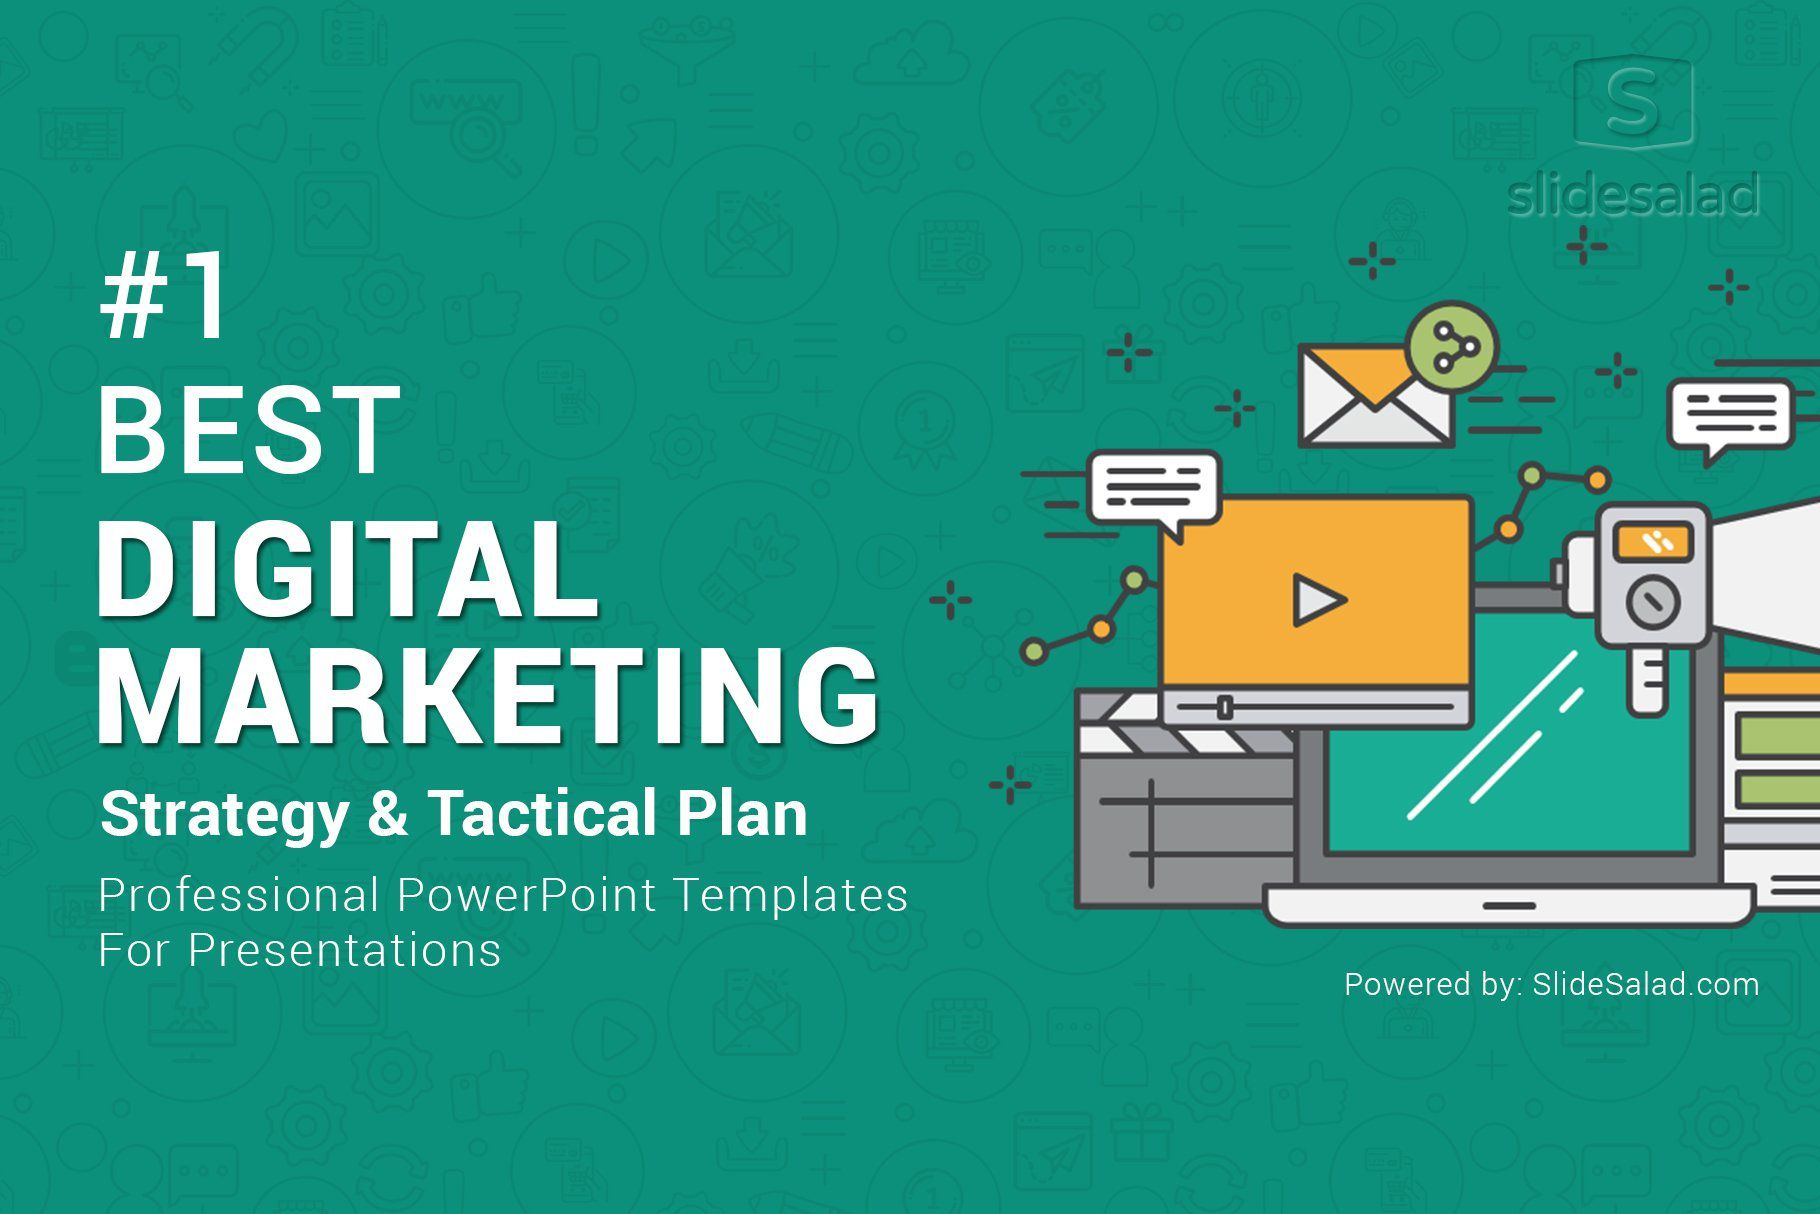 011 Rare Free Digital Marketing Plan Template Ppt Concept Full